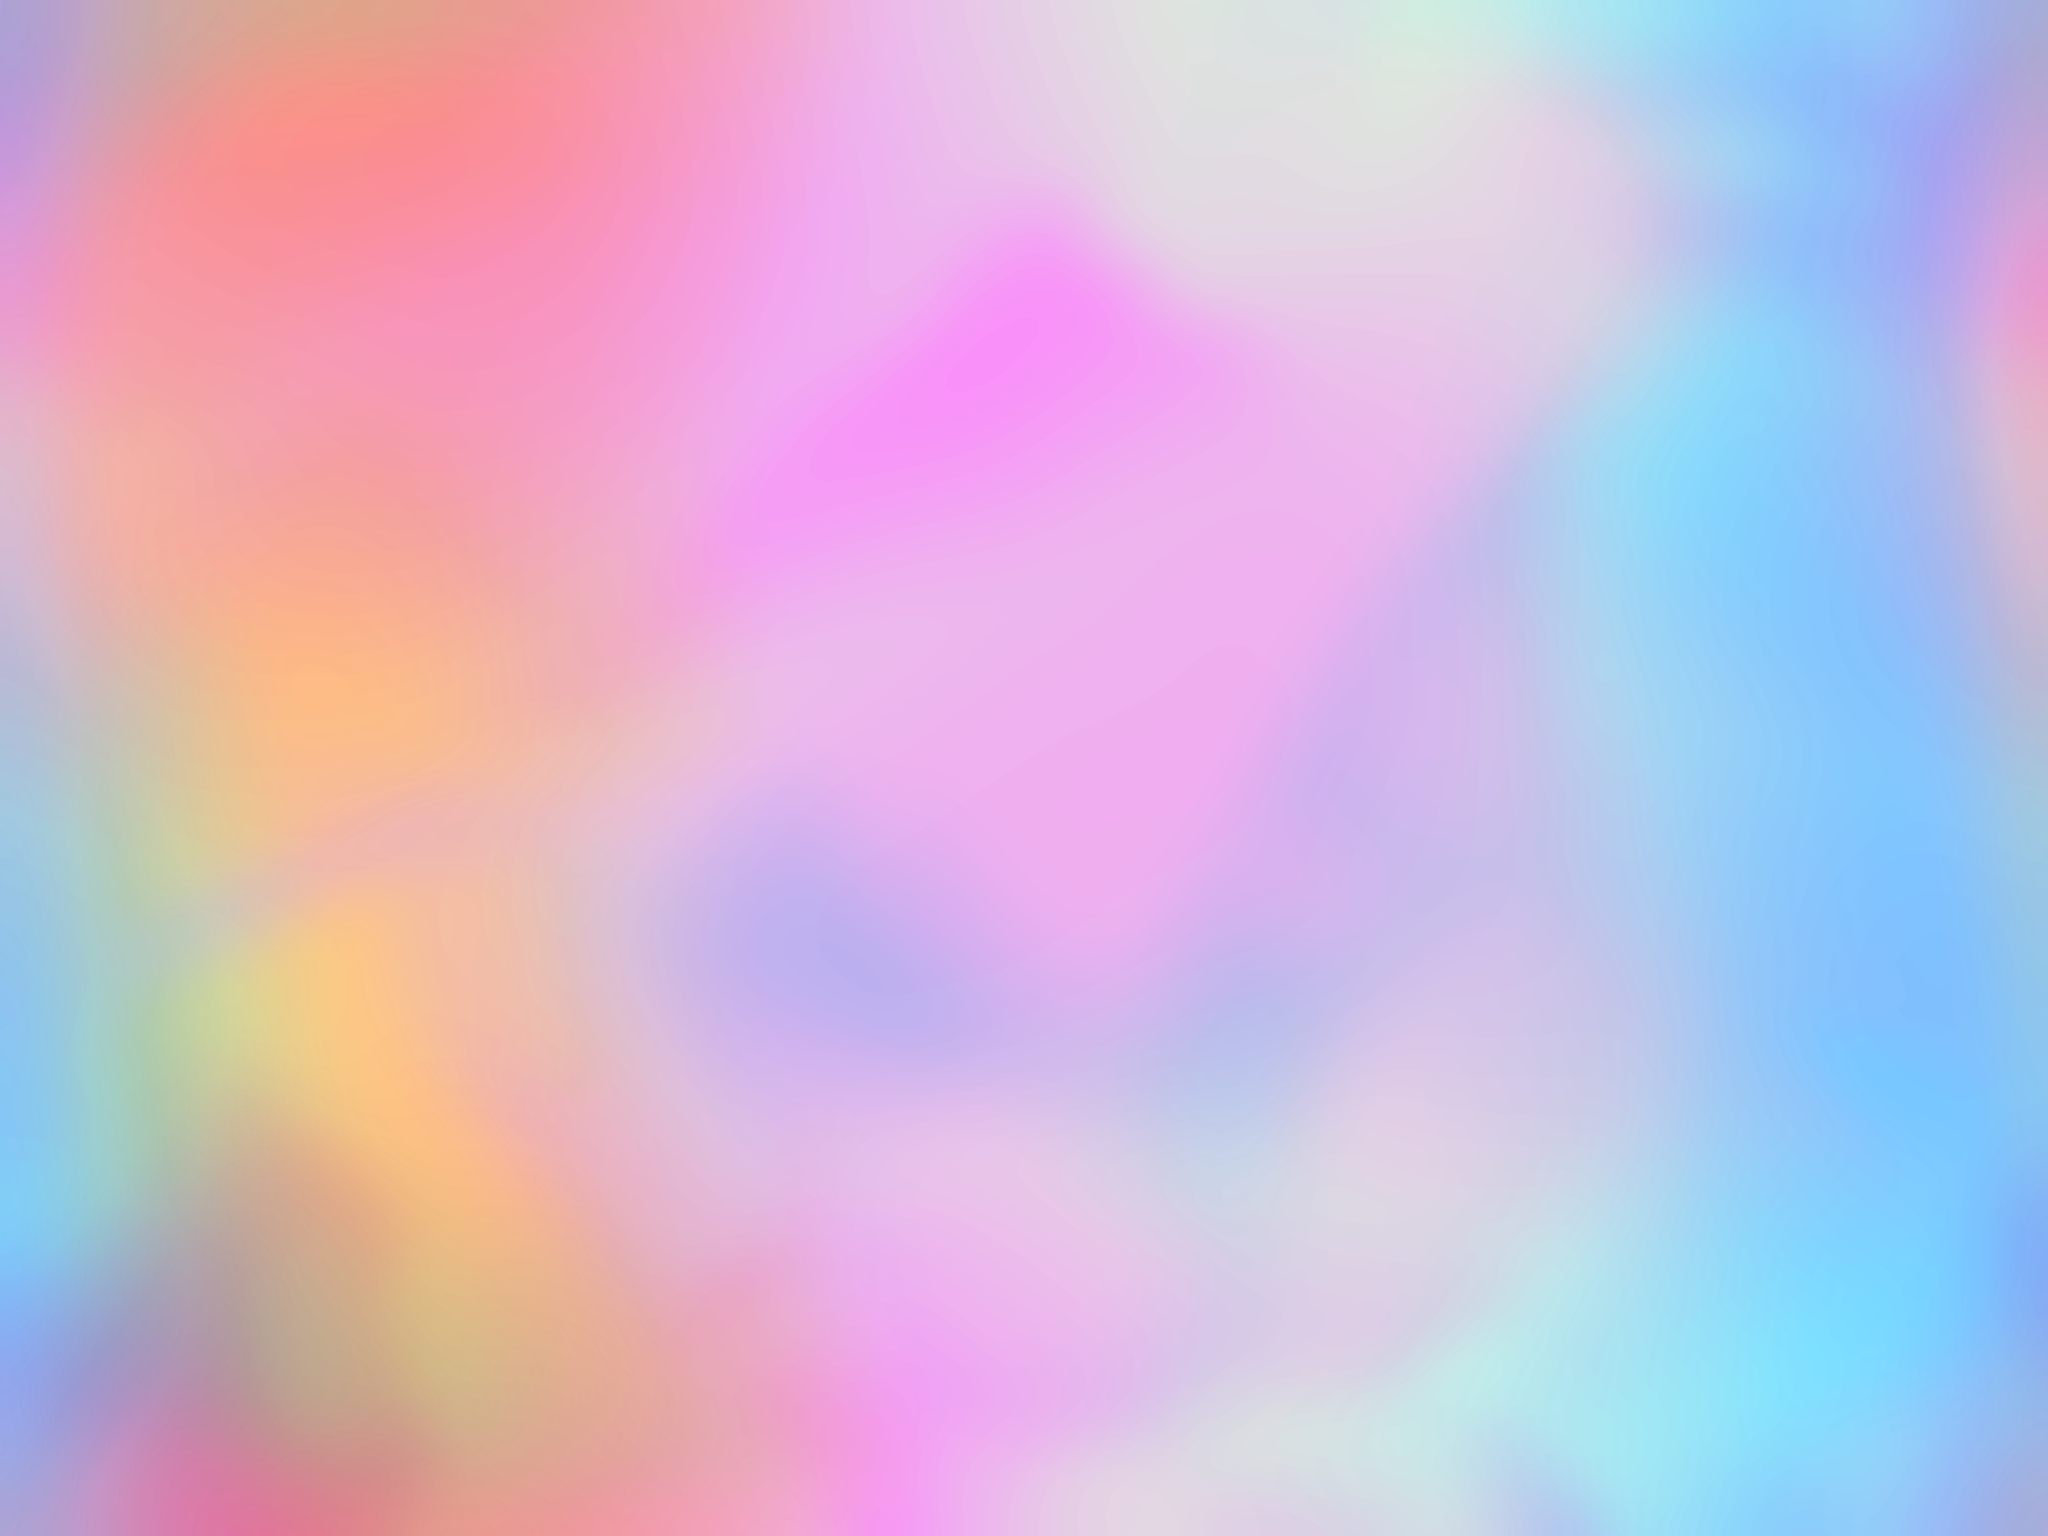 Ipad Retina Wallpaper Abstrait 2 Png 2048 1536 Rainbow Wallpaper Backgrounds Pastel Wallpaper Pastel Color Wallpaper